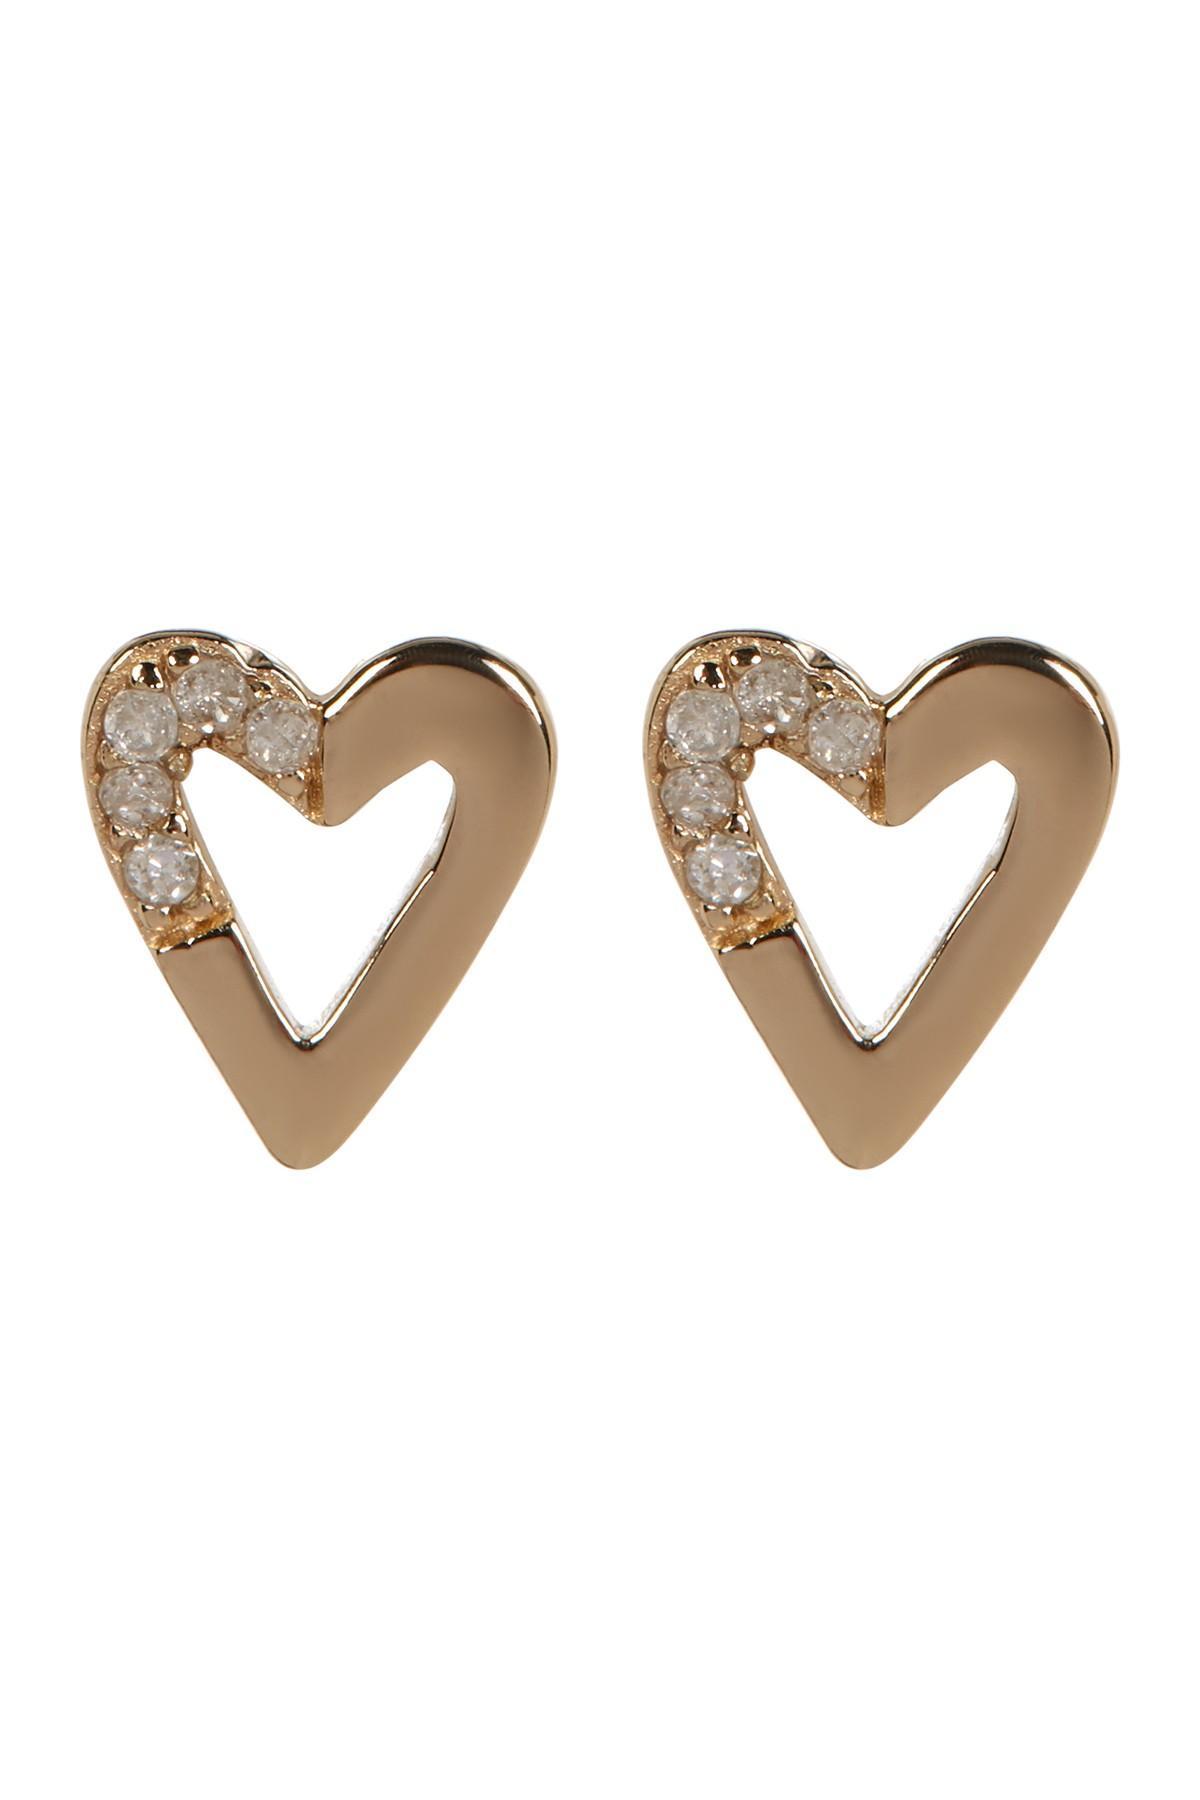 Flat Back Diamond Stud Earrings